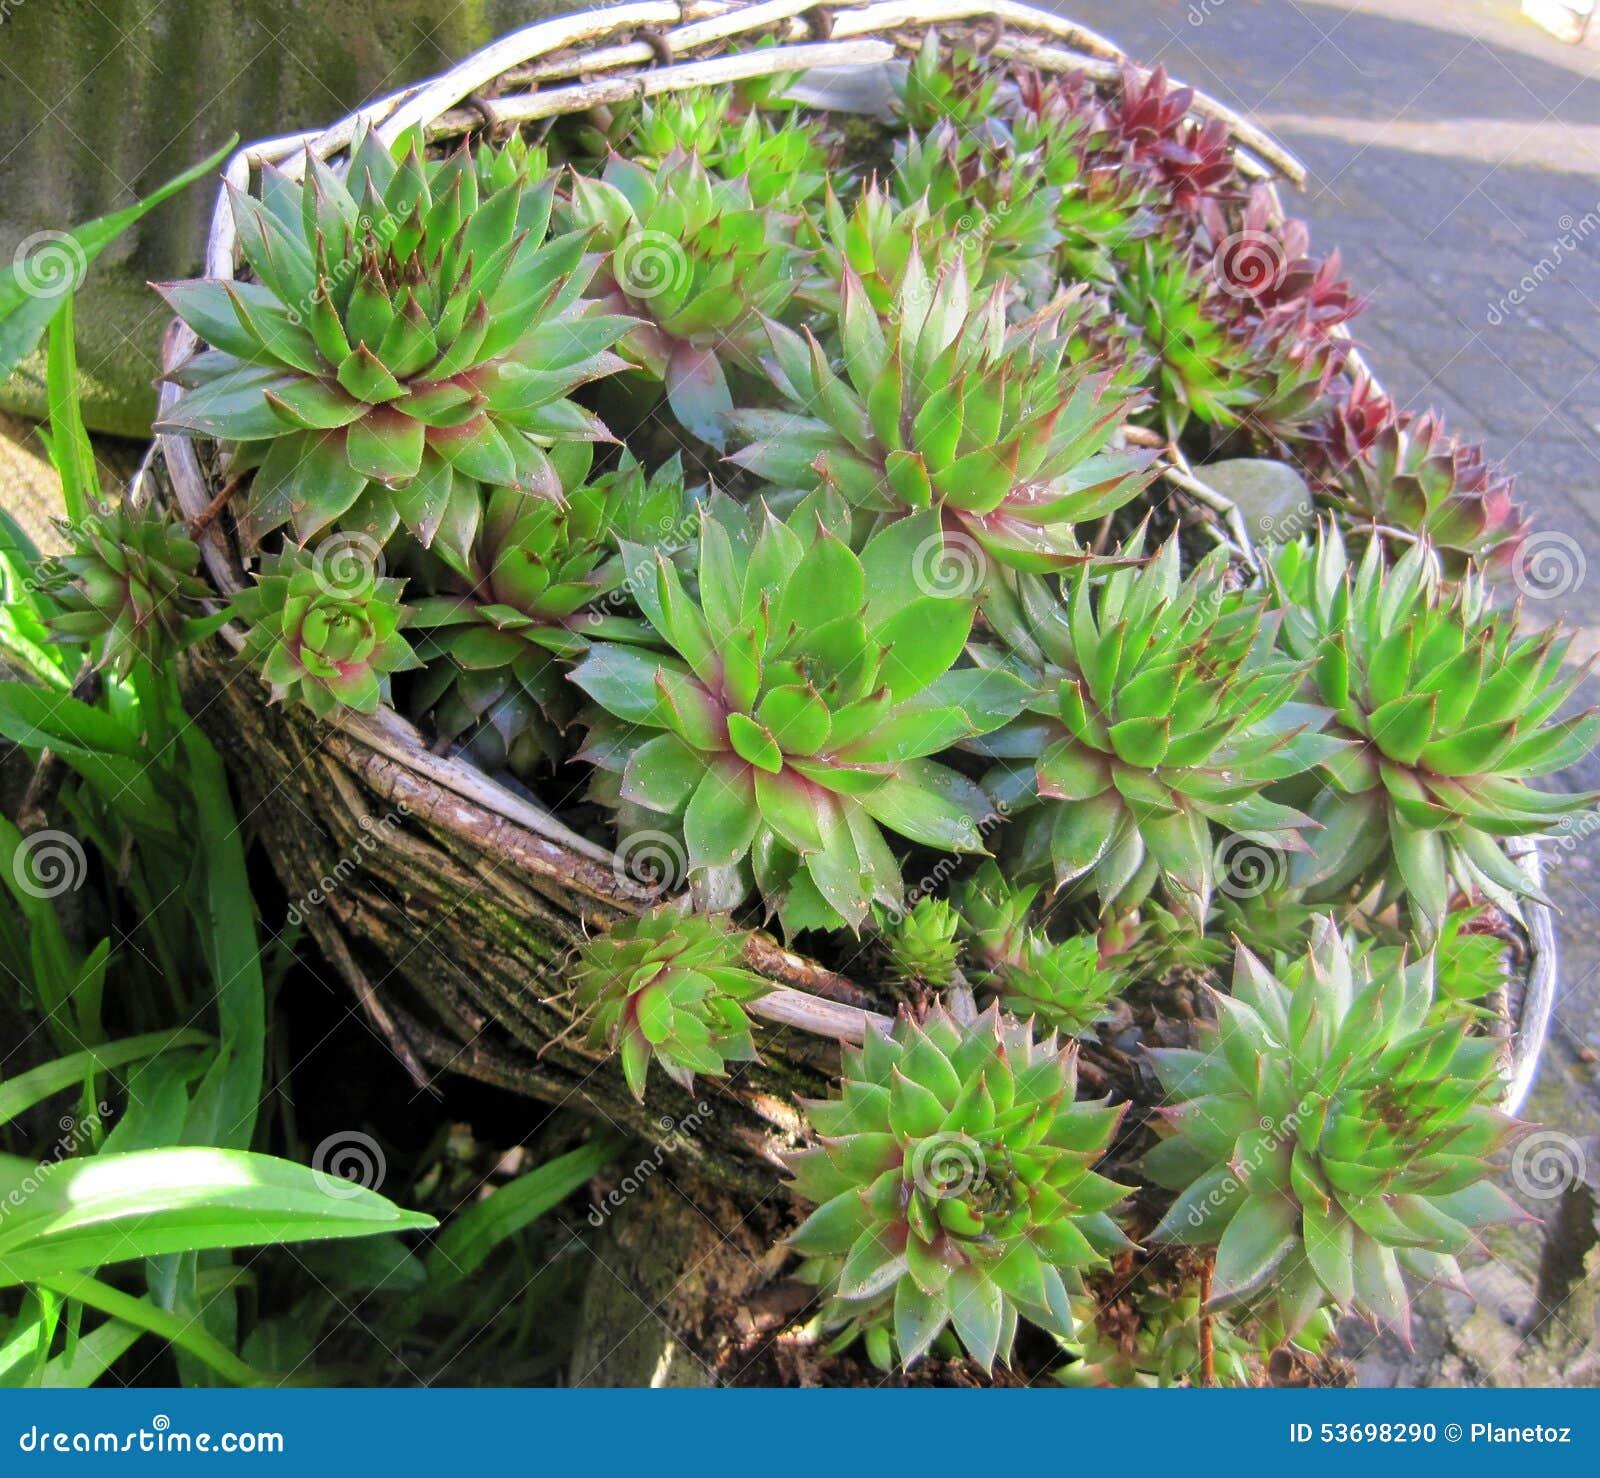 Garden Design Cactus Stock Photo Image 53698290